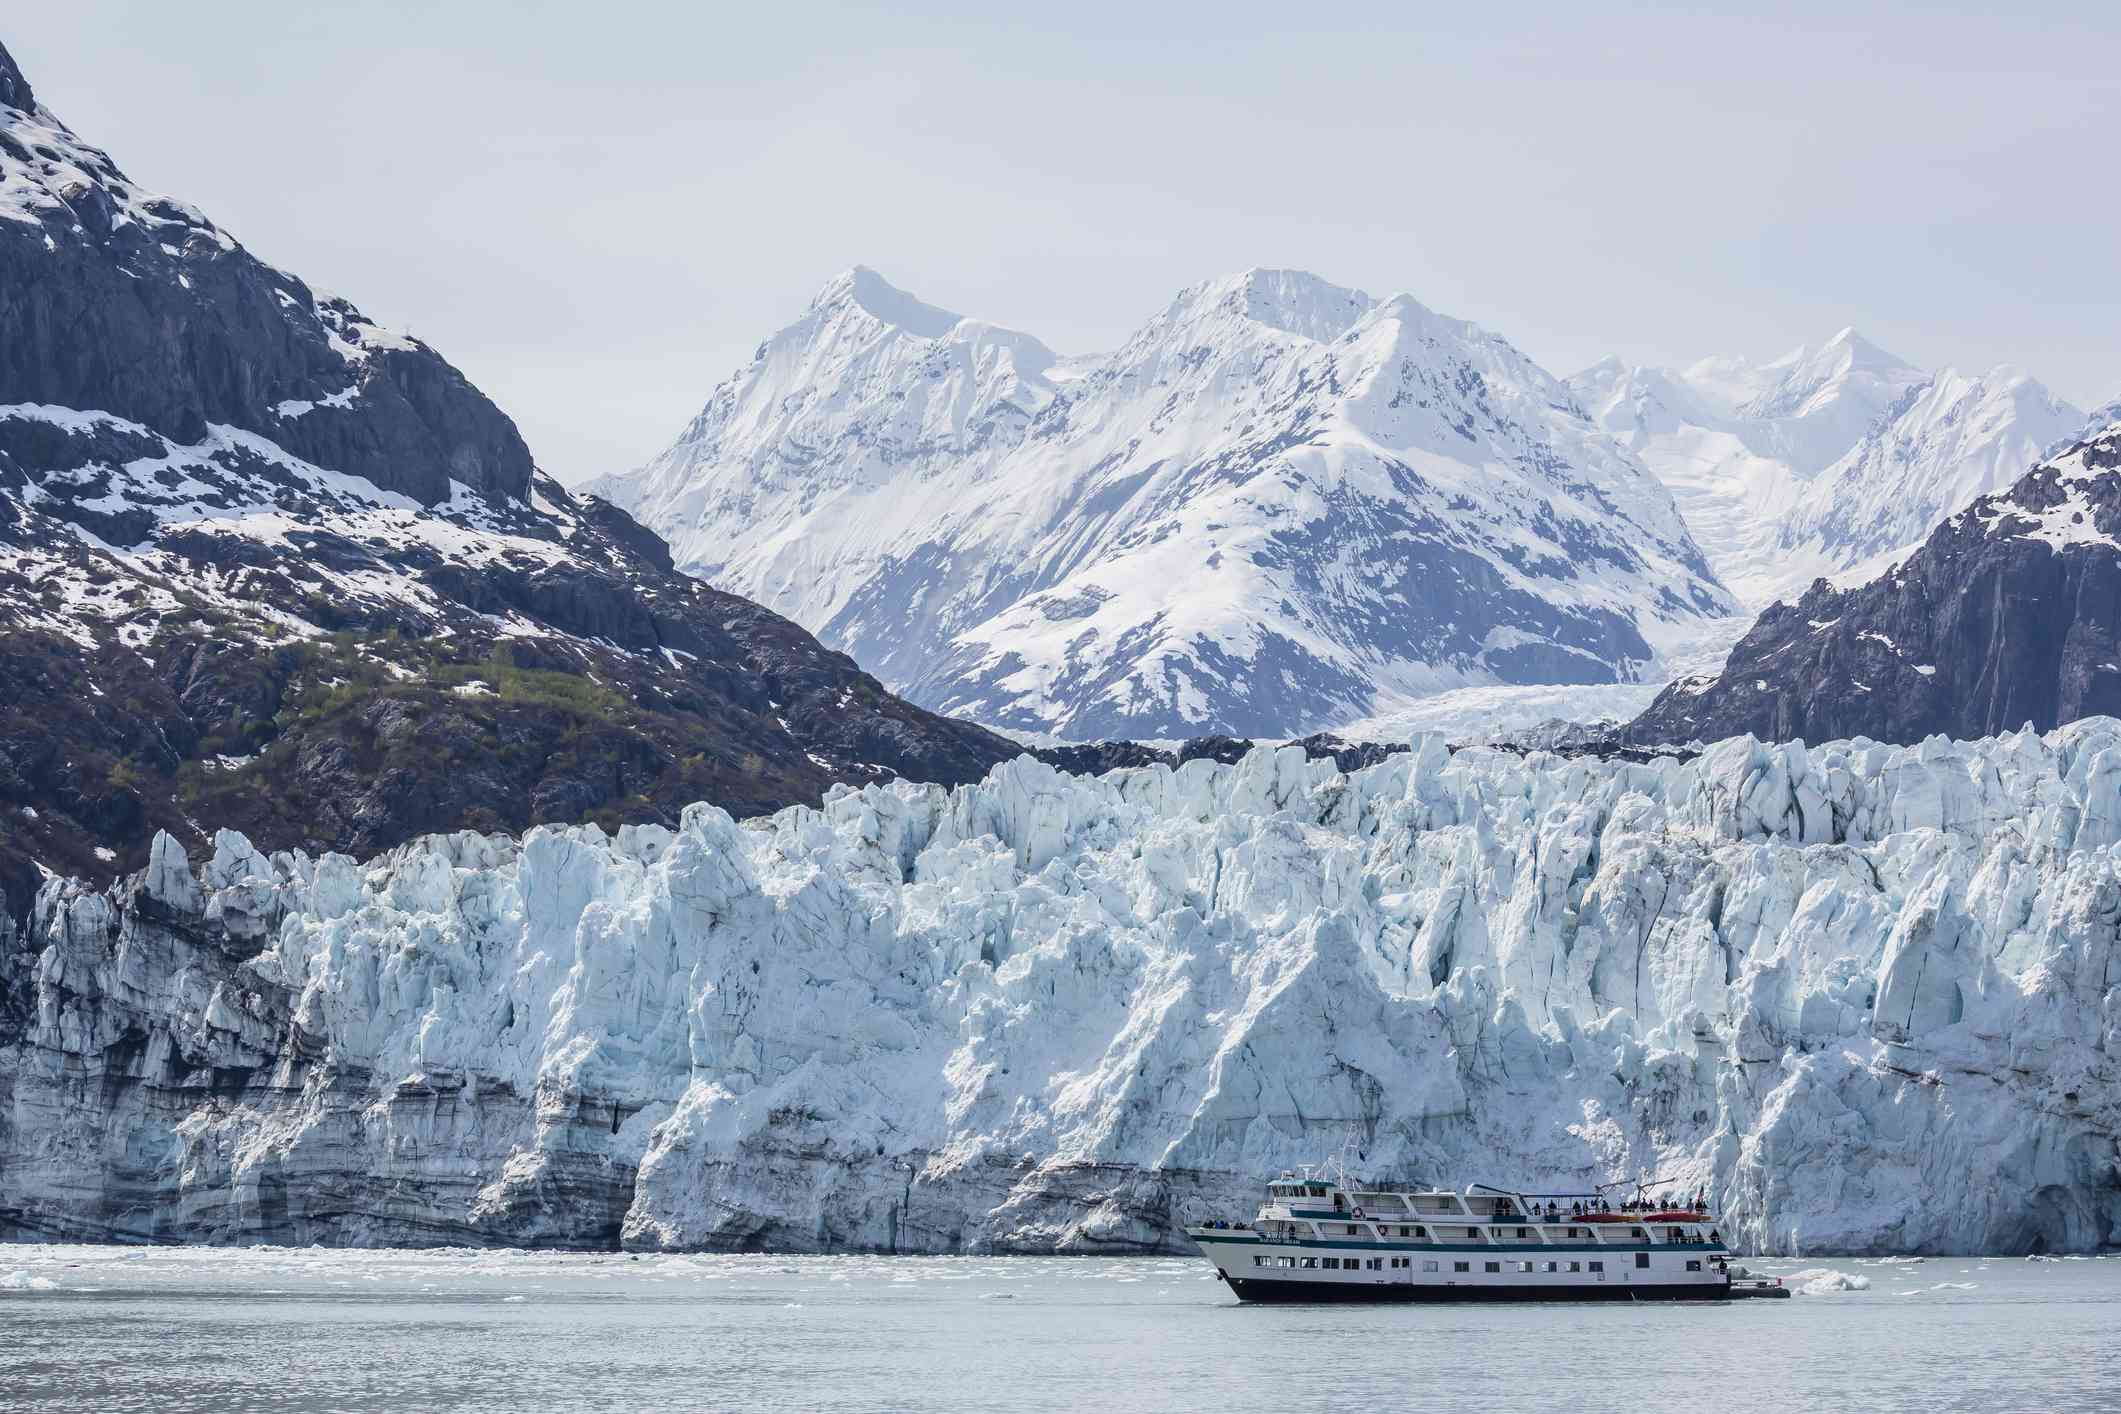 A tourist ship explores the Lamplugh Glacier